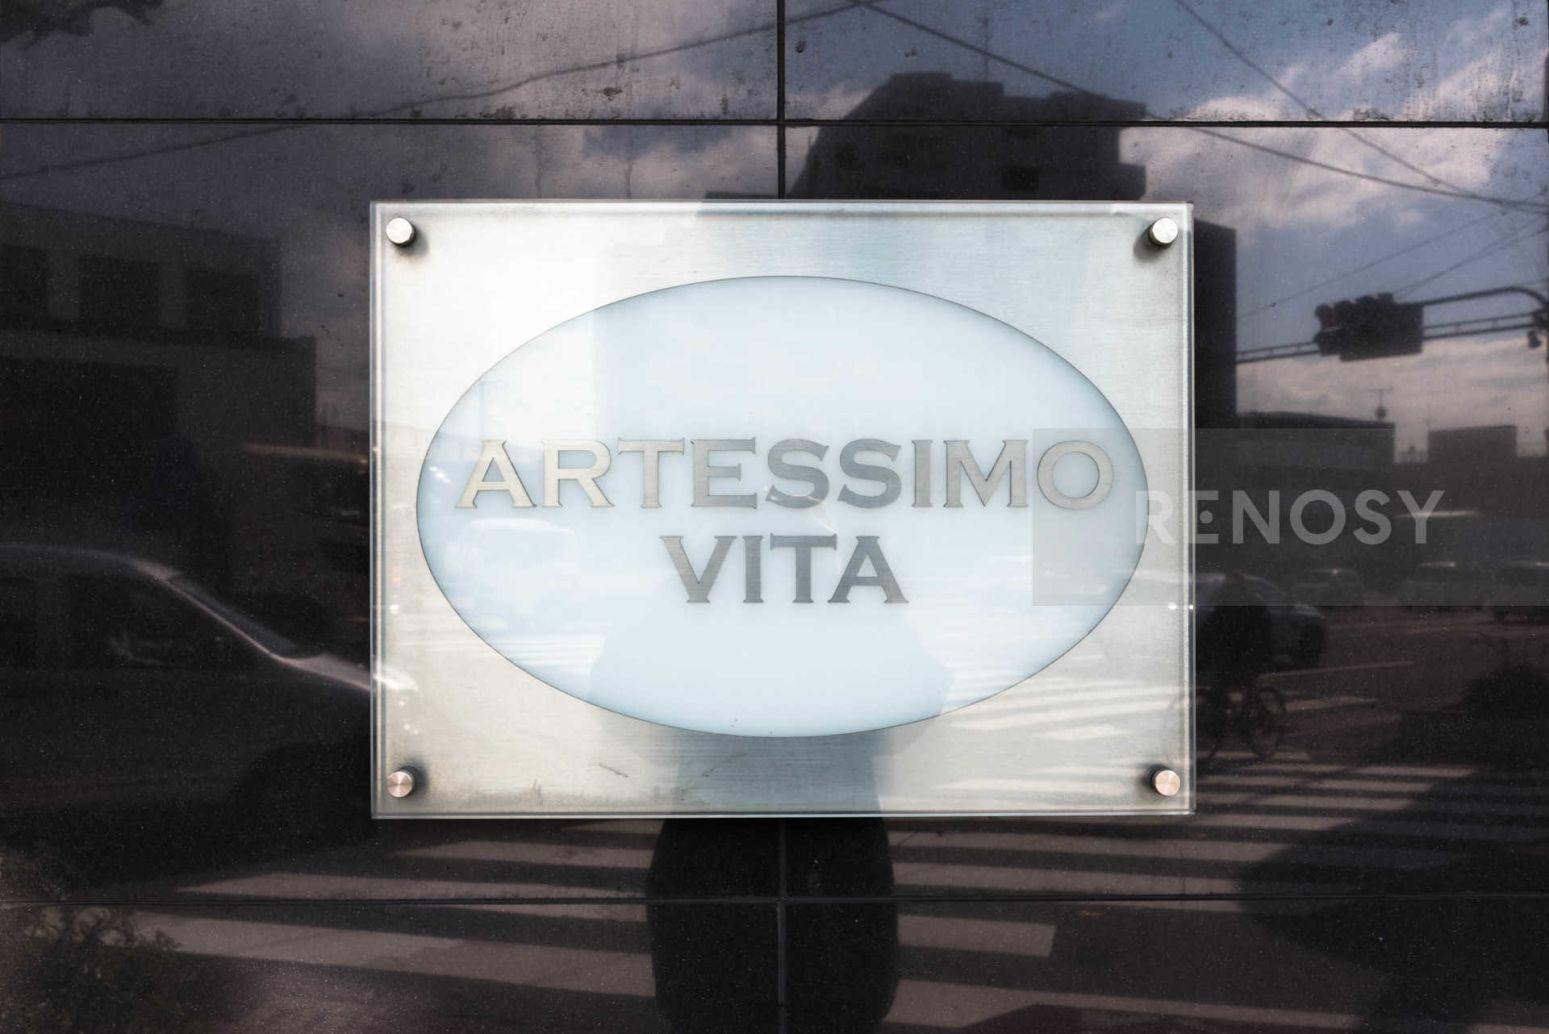 ARTESSIMO VITA